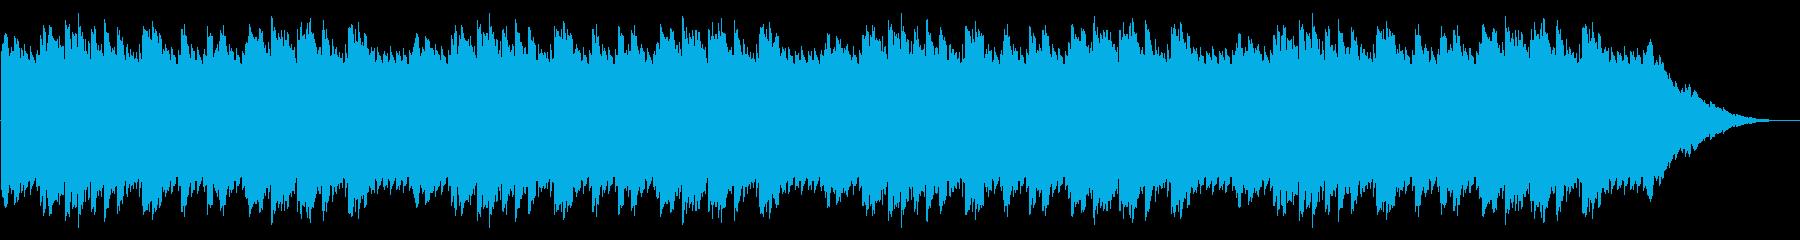 NES RPG B06-1(街4) の再生済みの波形